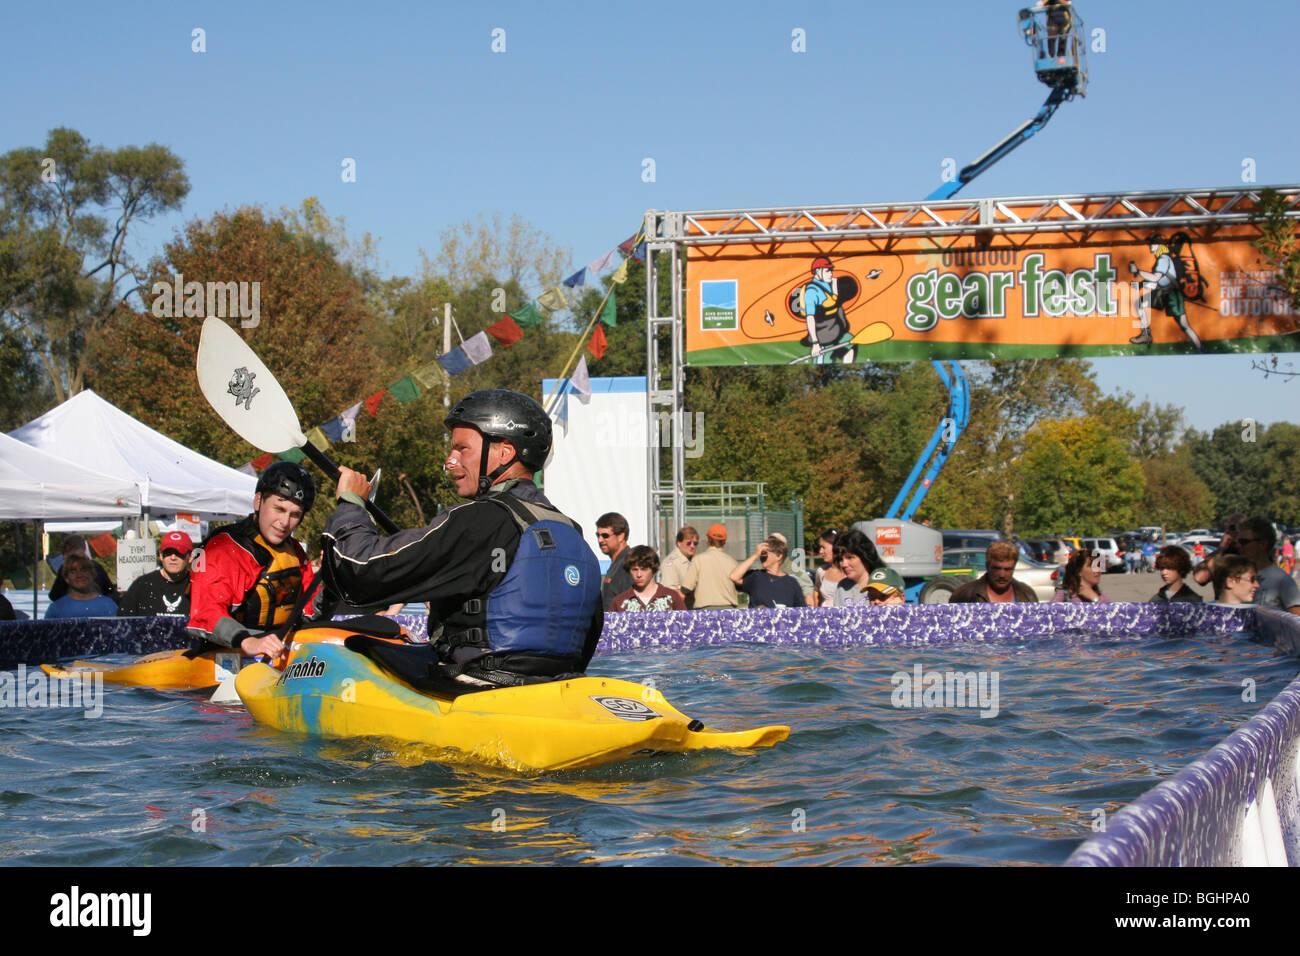 Kayak Demonstration at Gearfest, Eastwood Metropark, Dayton, Ohio. - Stock Image